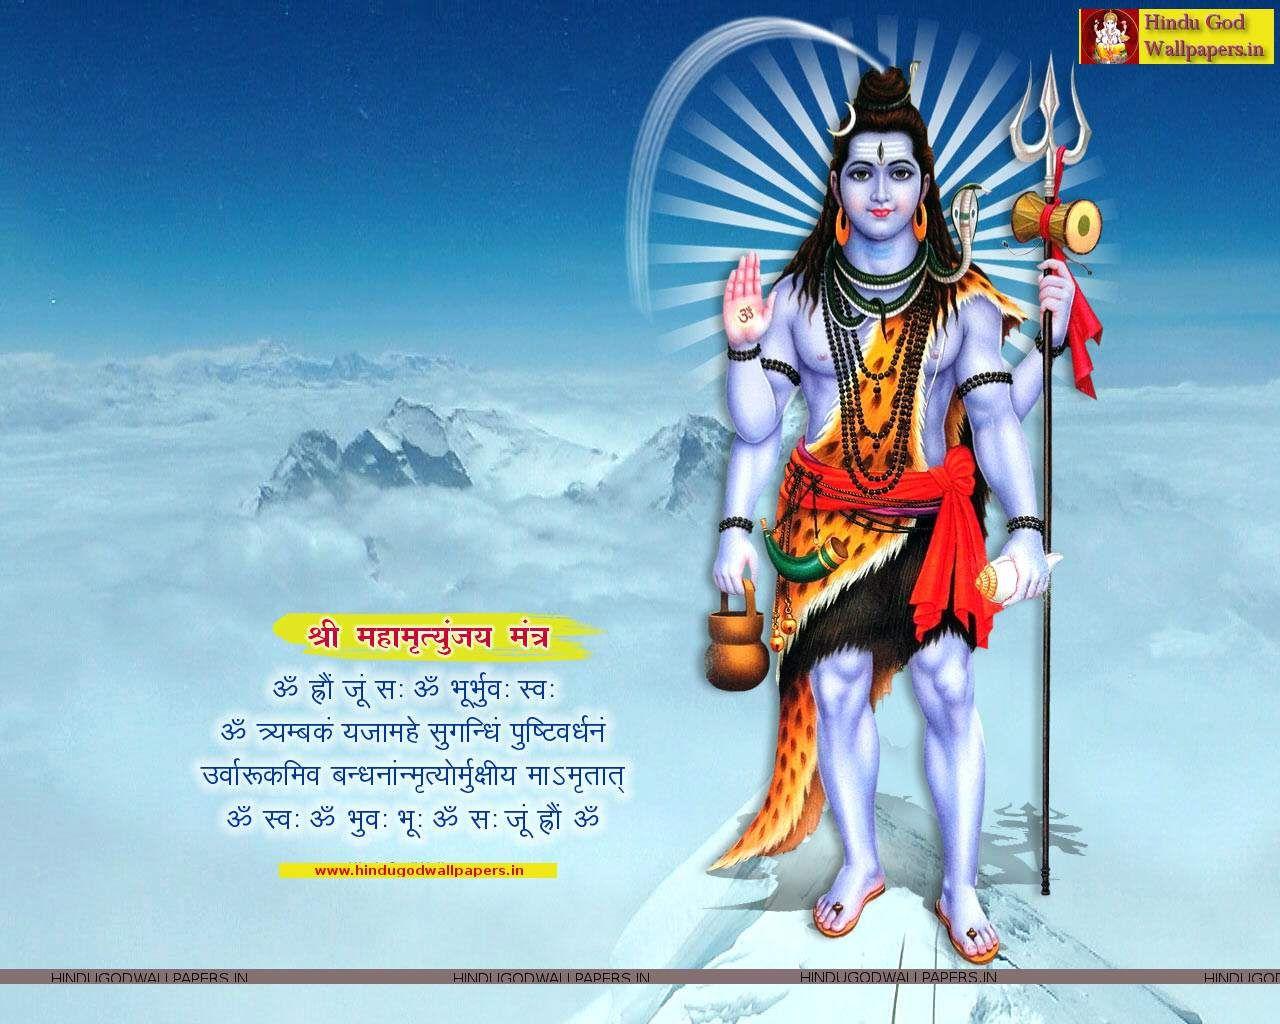 Fantastic Wallpaper High Quality Shiva - a6069e6efe8ffee3003b028502adbad6  2018_983911.jpg